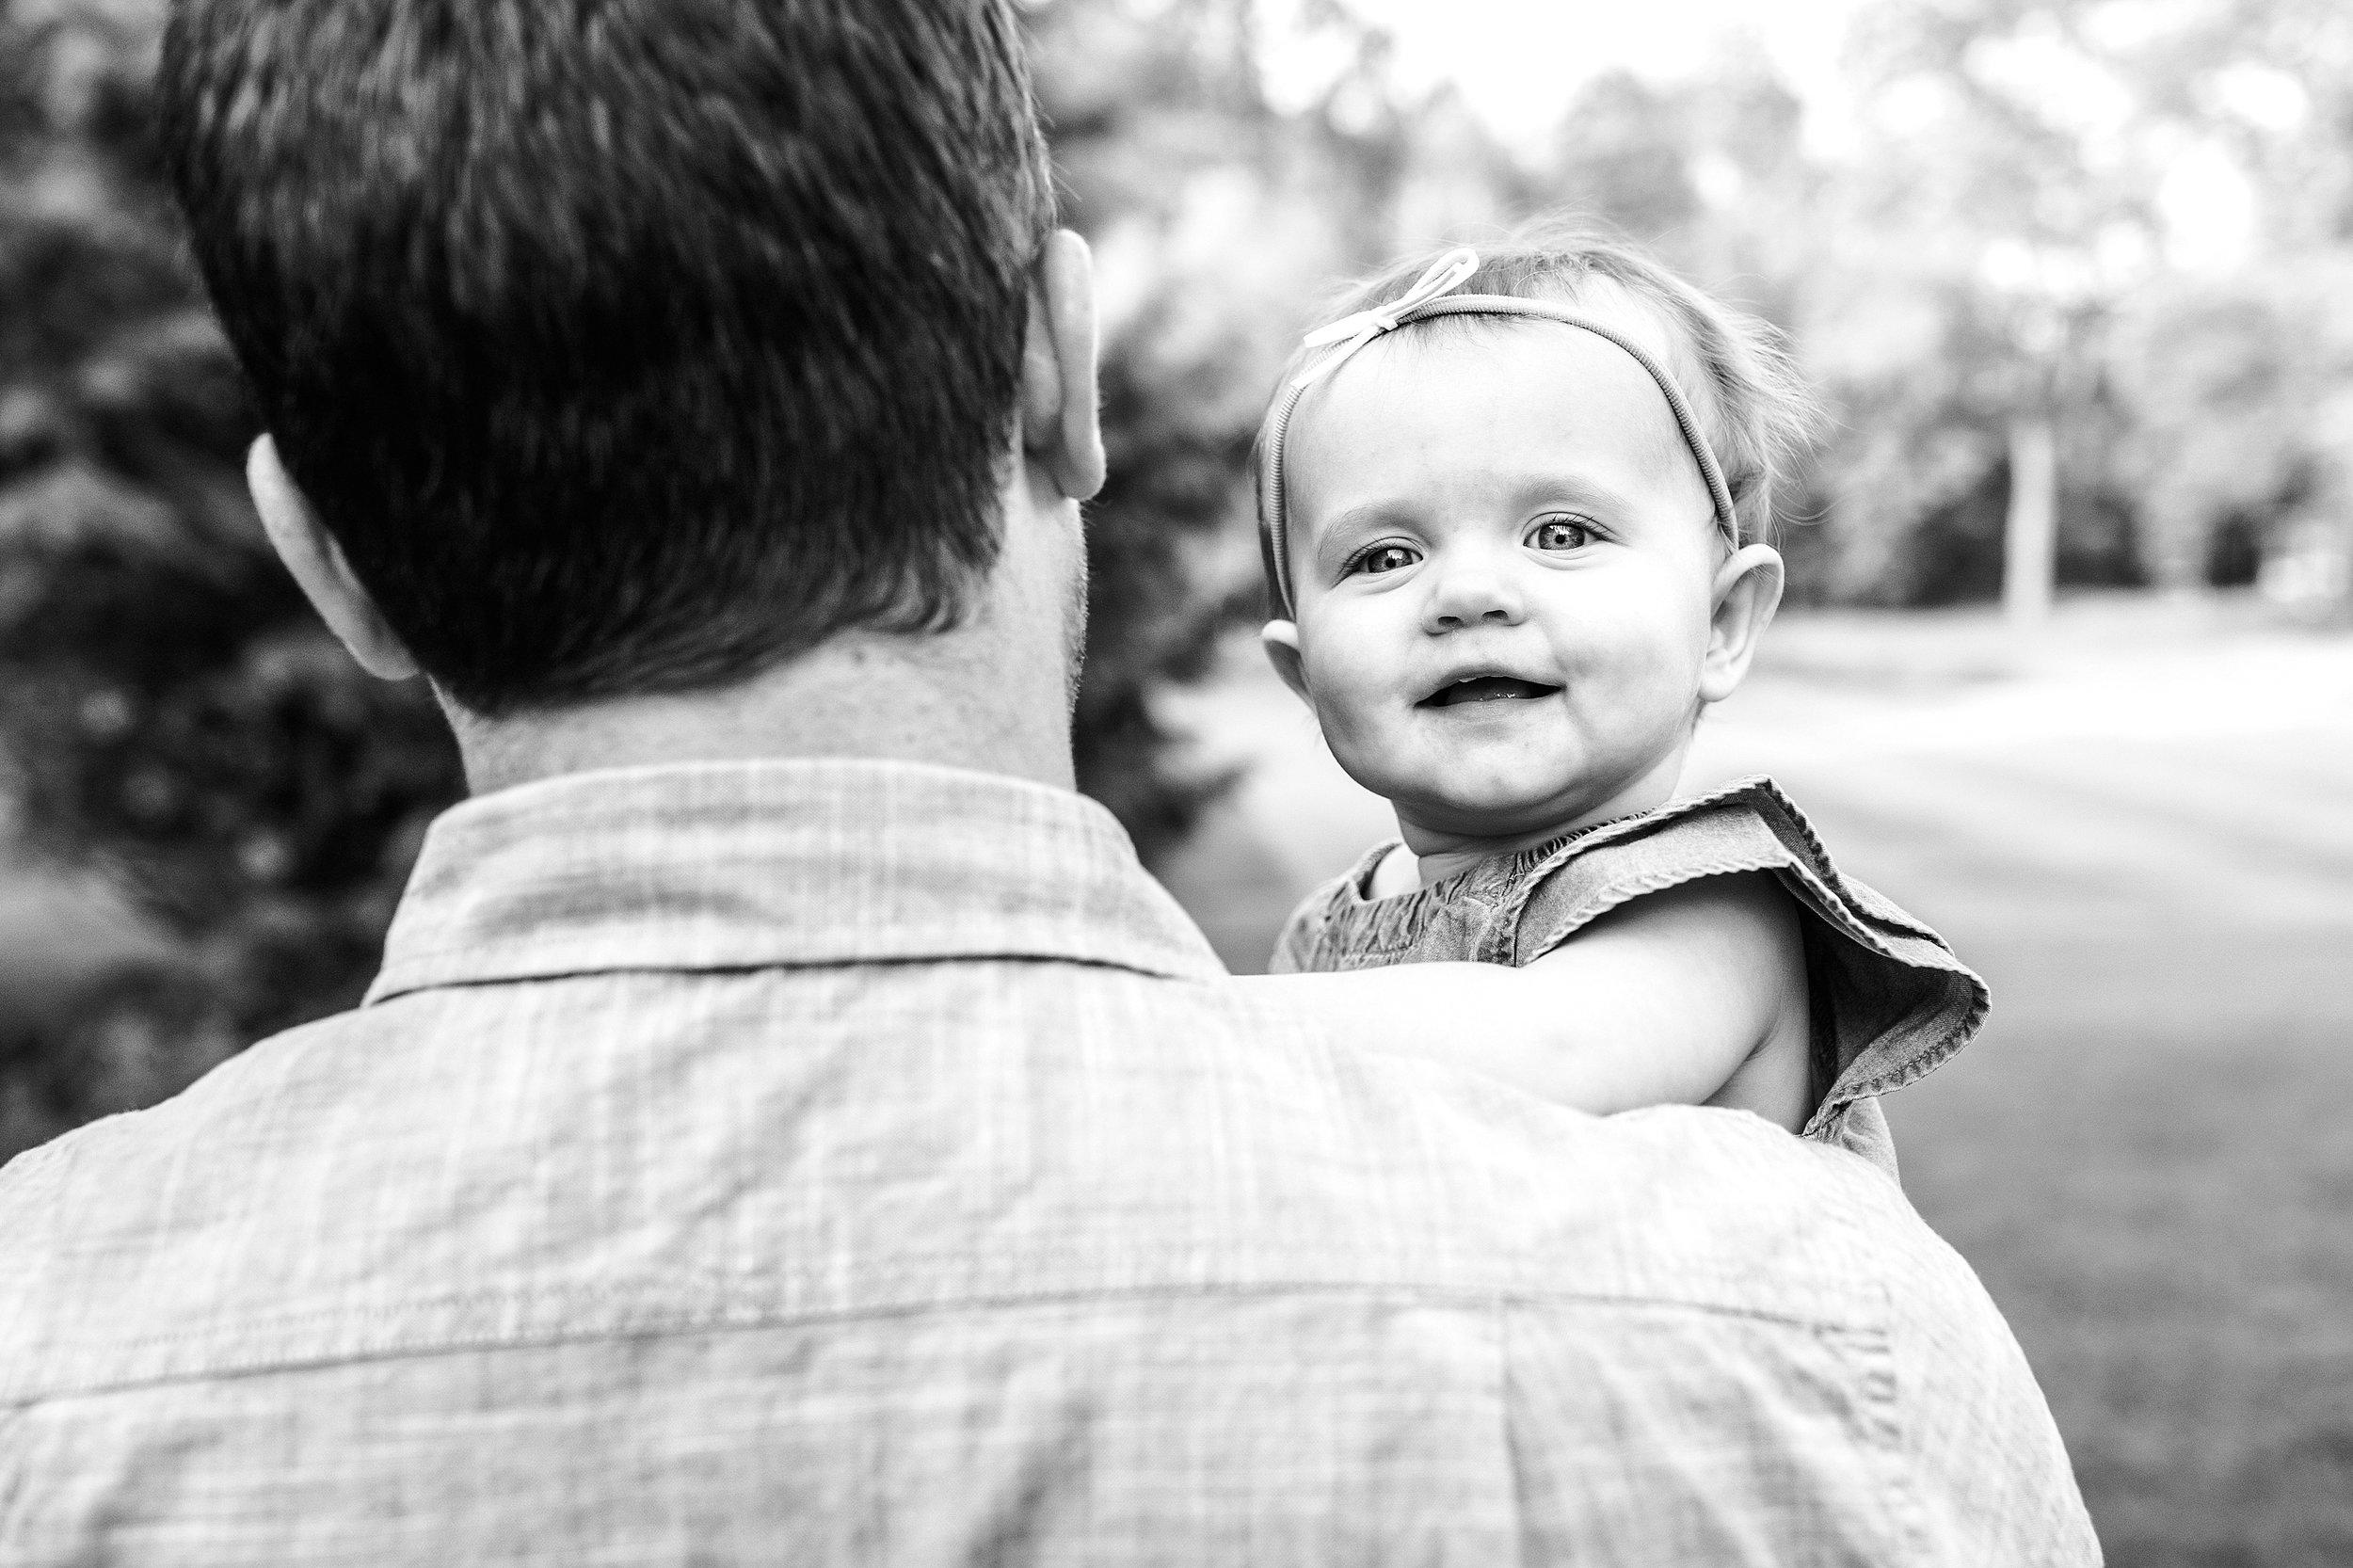 Lehigh-Valley-Family-Photographer_0008.jpg